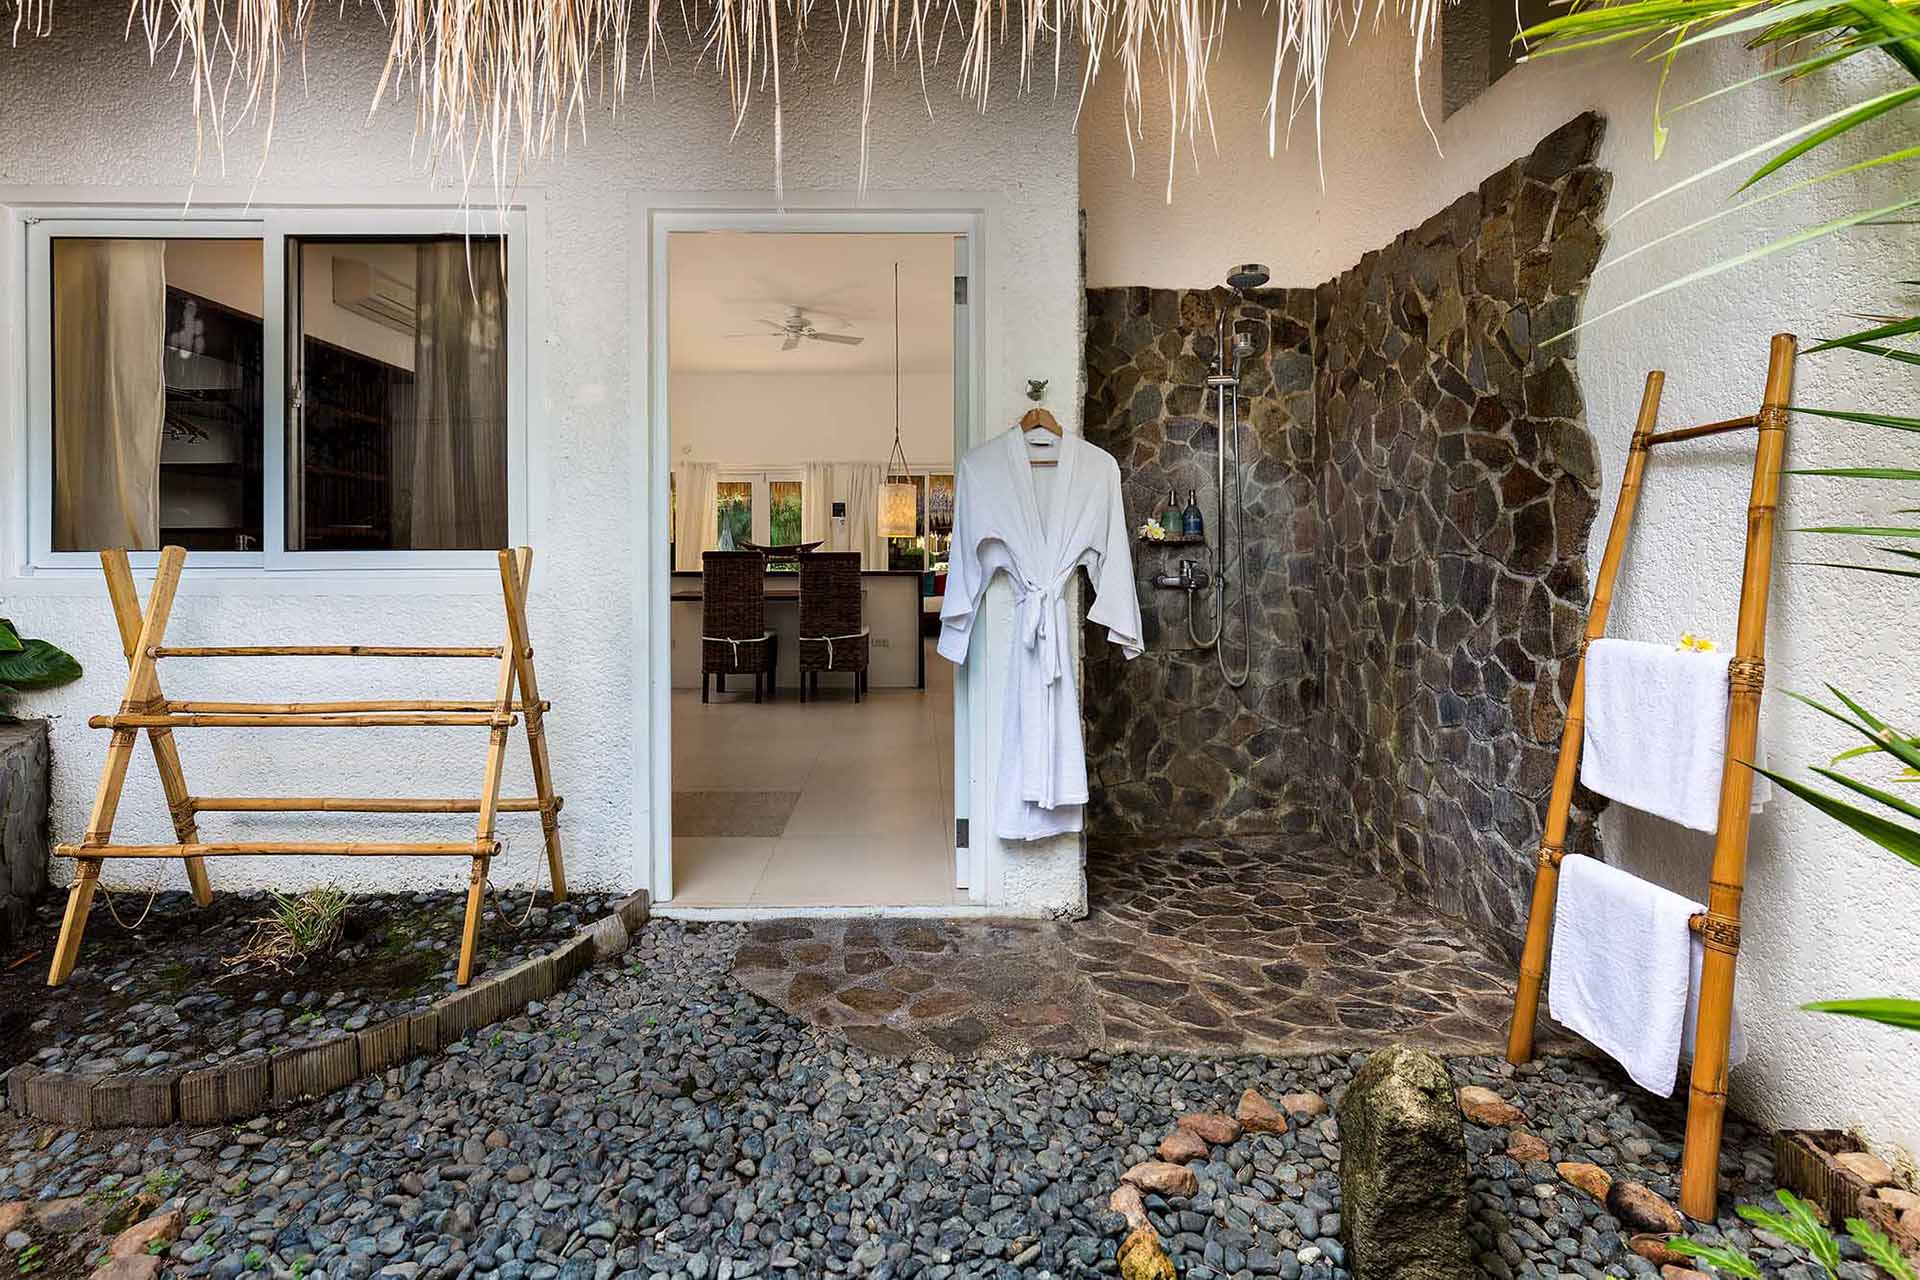 Deluxe Suite Bathroom at Atmosphere Resort Philippines